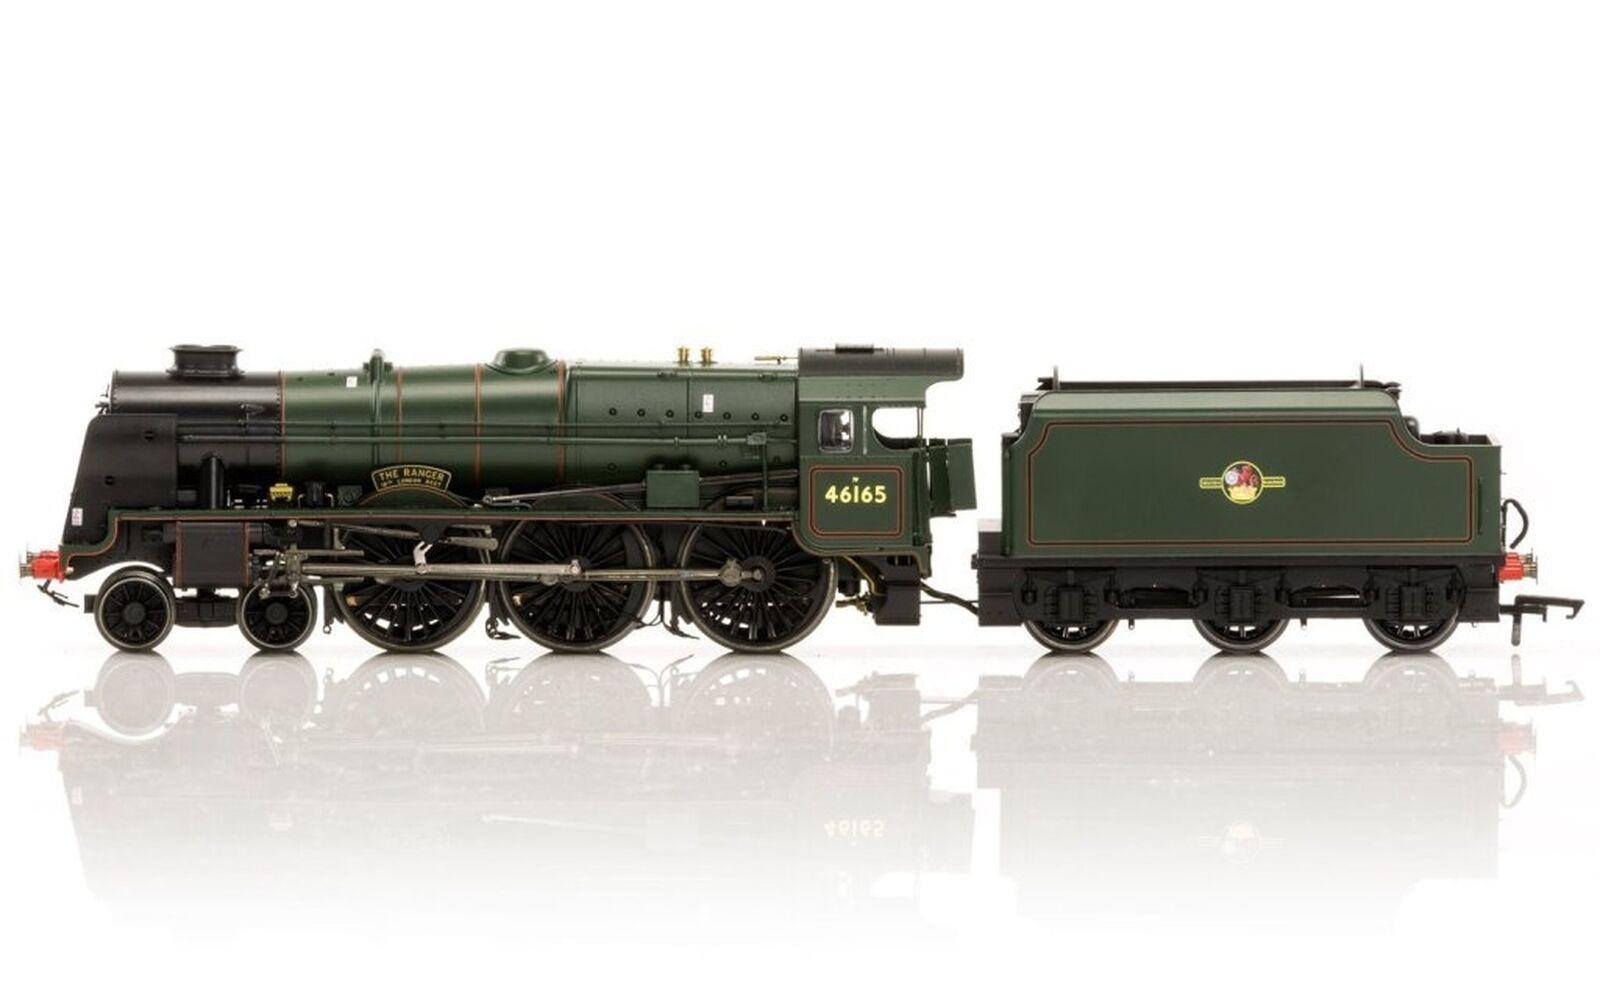 Hornby Hornby Hornby R3558 4-6-0 The Ranger 46165 Royal Scot classe Late BR Train modello Set 972bca